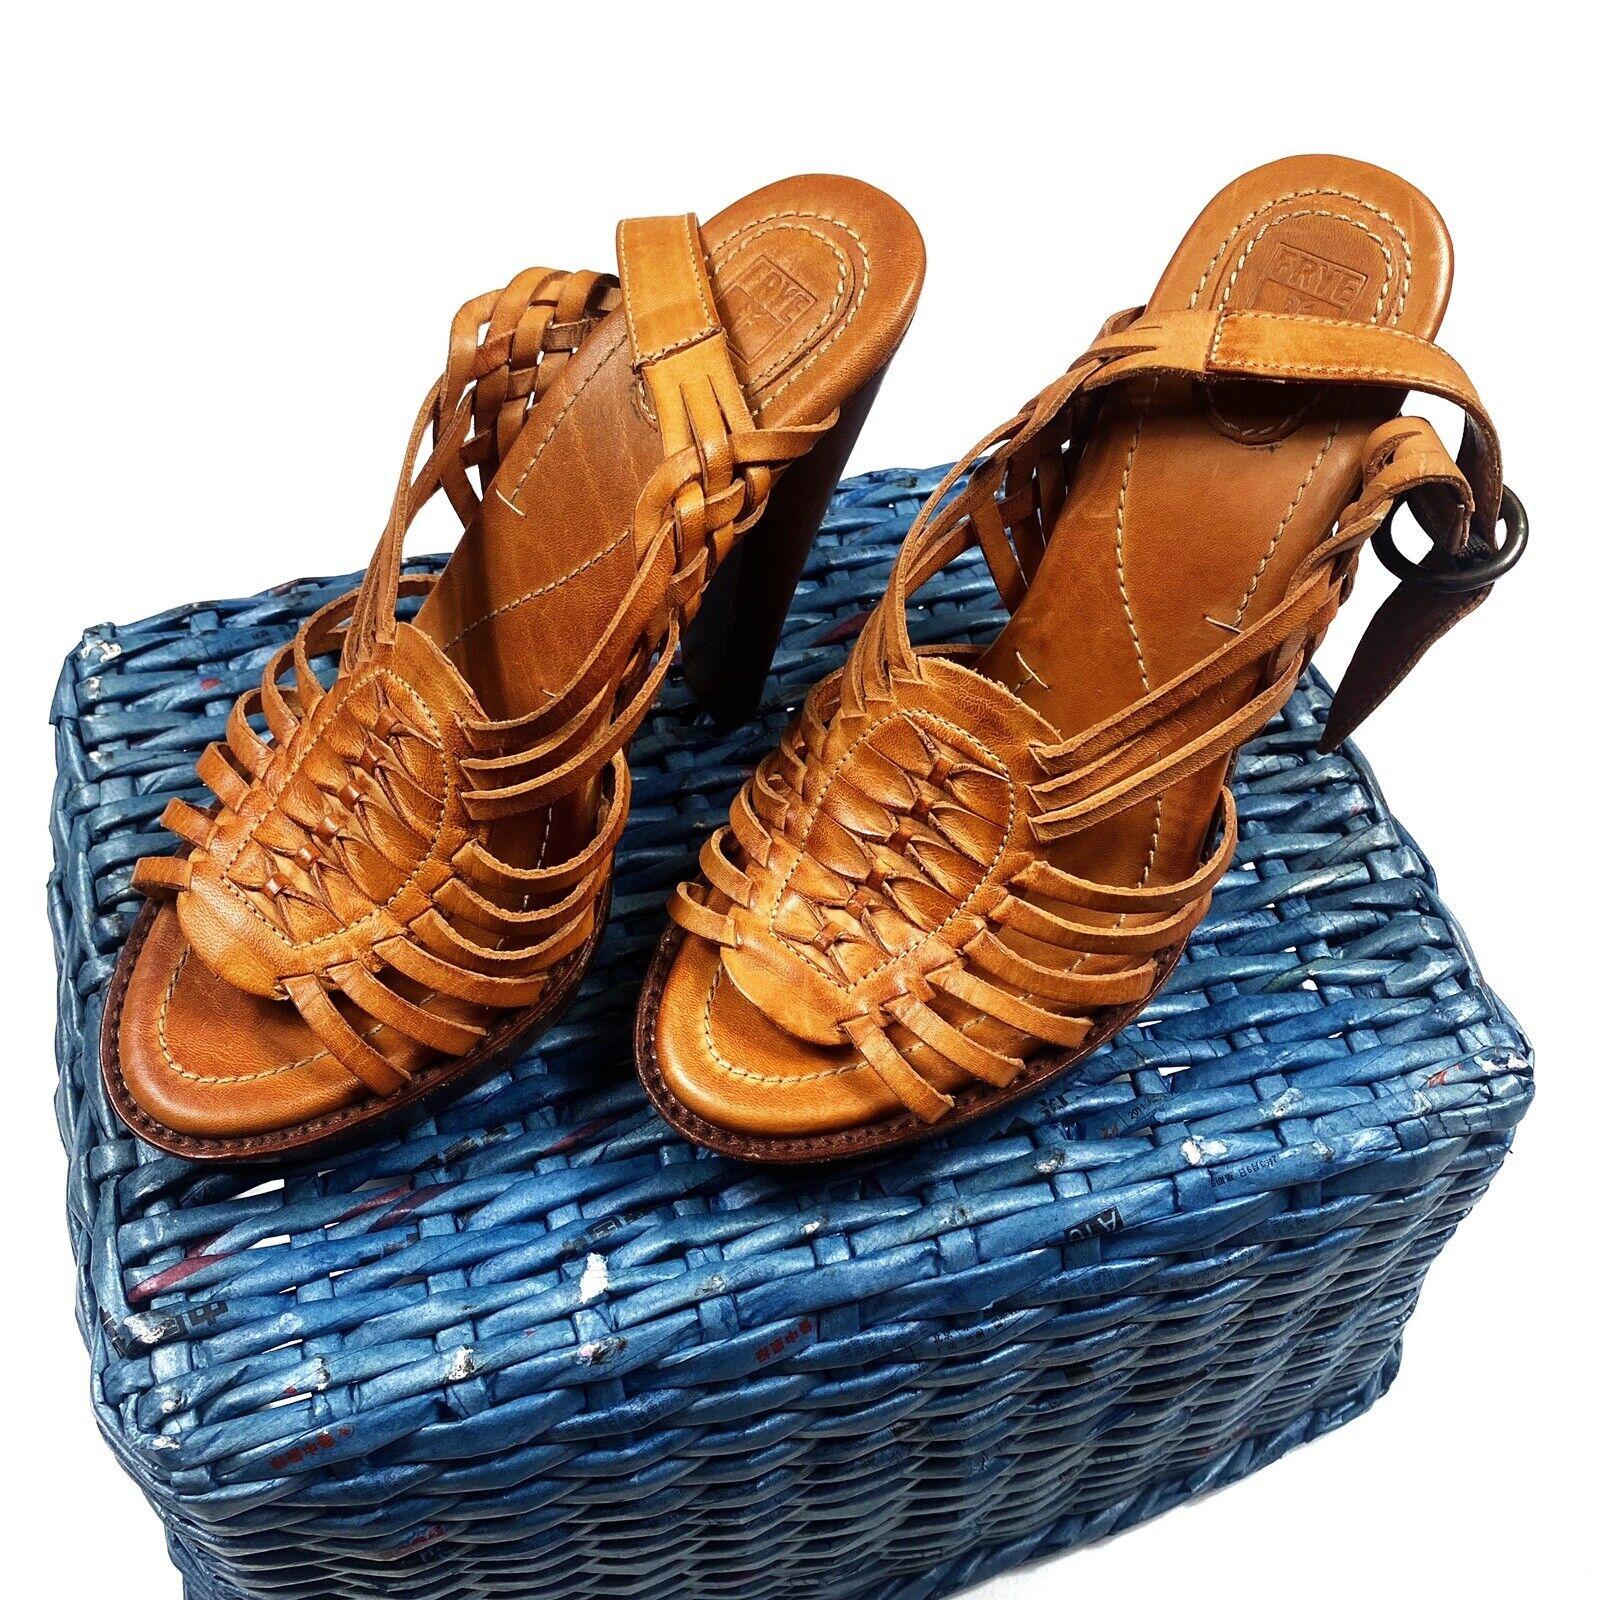 278 FRYE Joy Huarache Größe 8.5 Slingback Leather Braided Sandals Heels damen